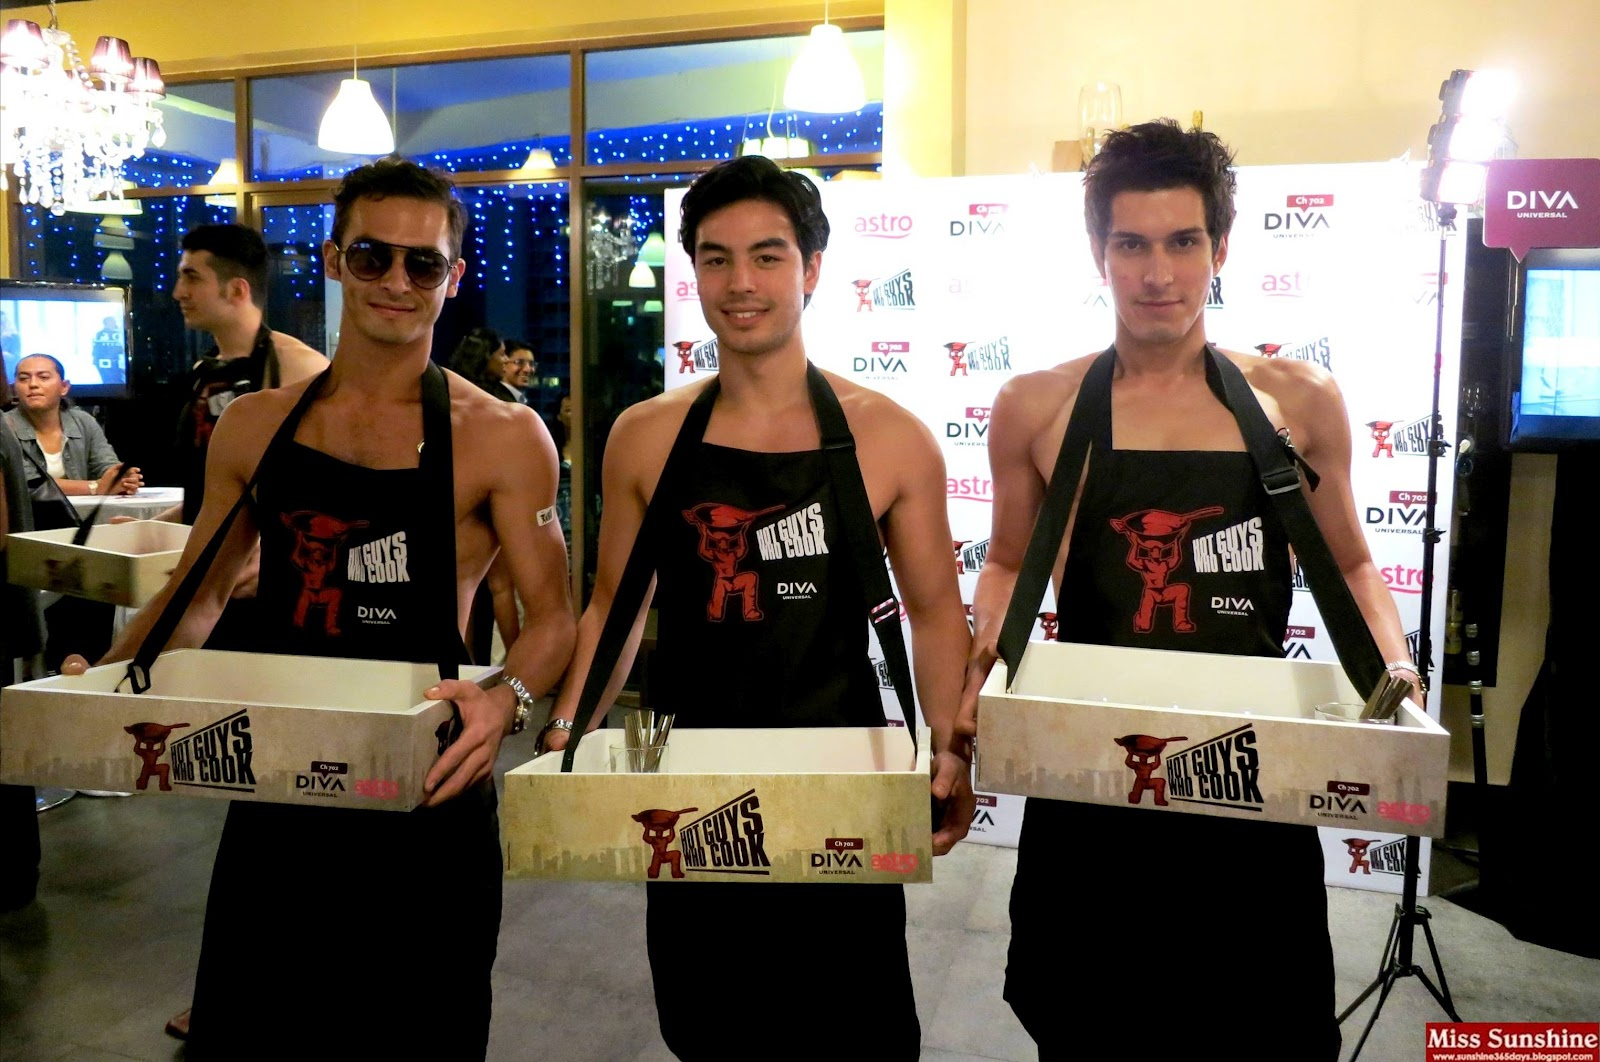 Sunshine kelly beauty fashion lifestyle travel fitness hot guys who cook by diva - Fashion diva tv ...